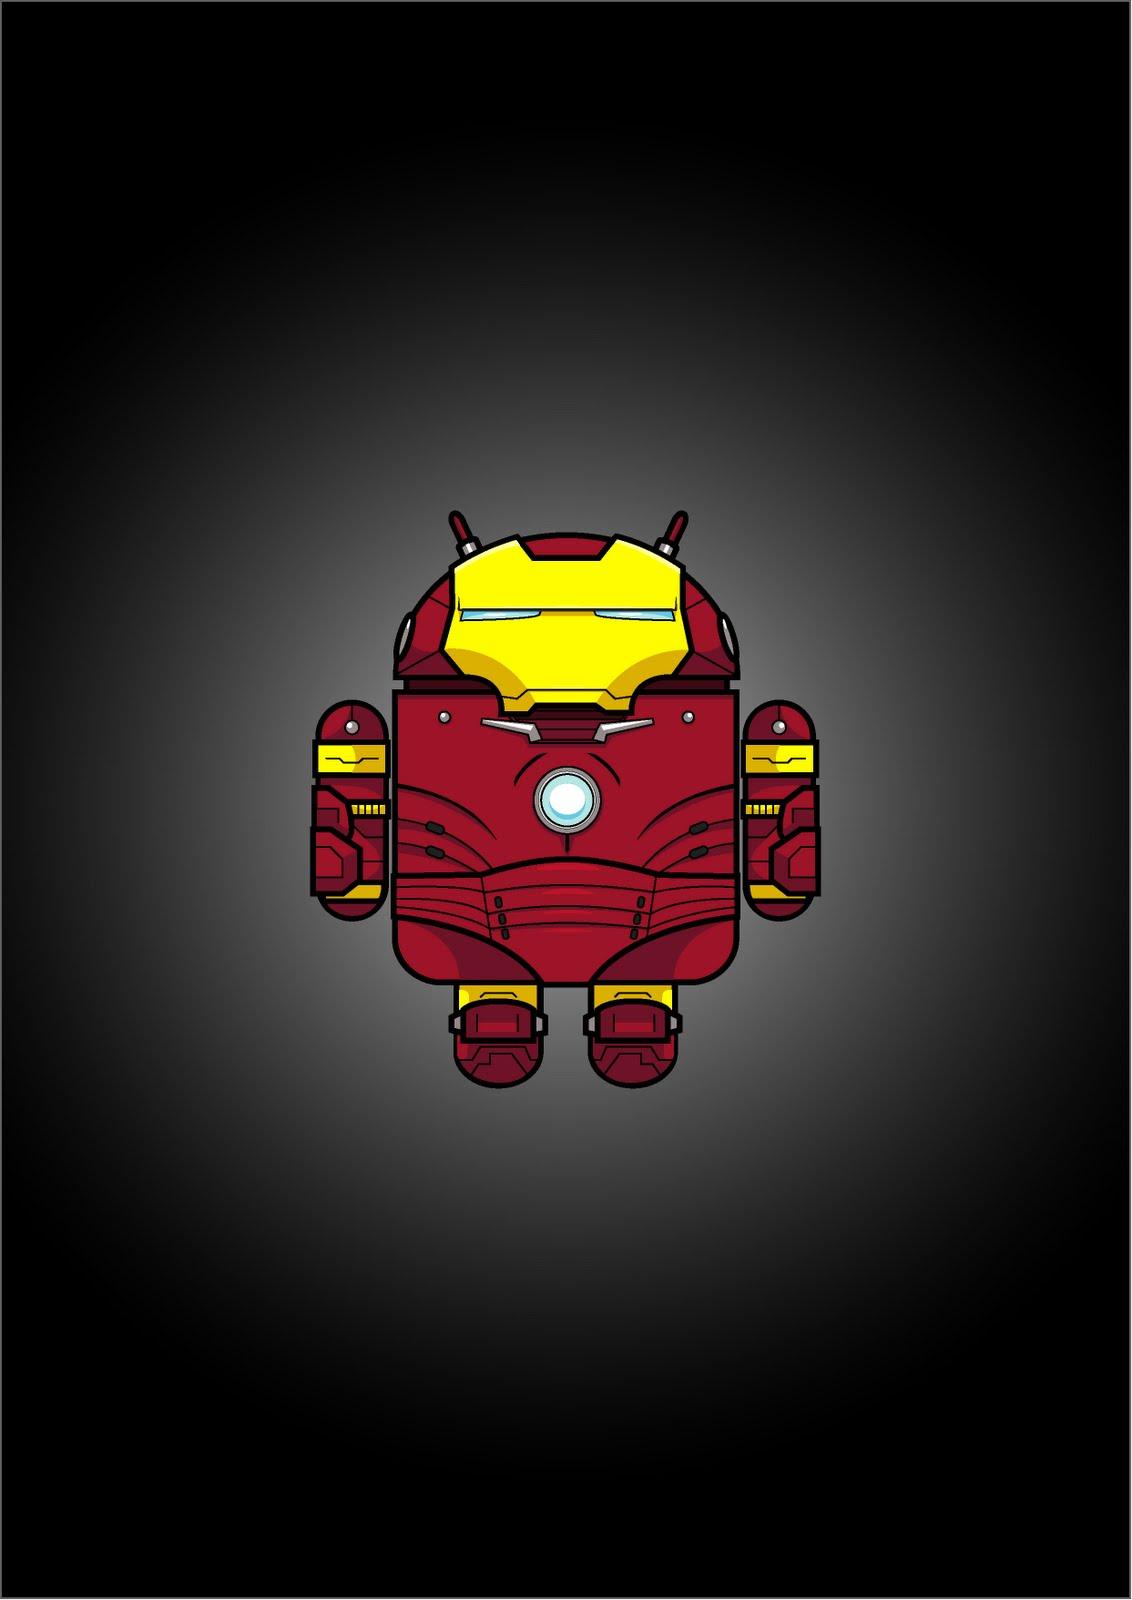 Marvel Pinball - Apps on Google Play